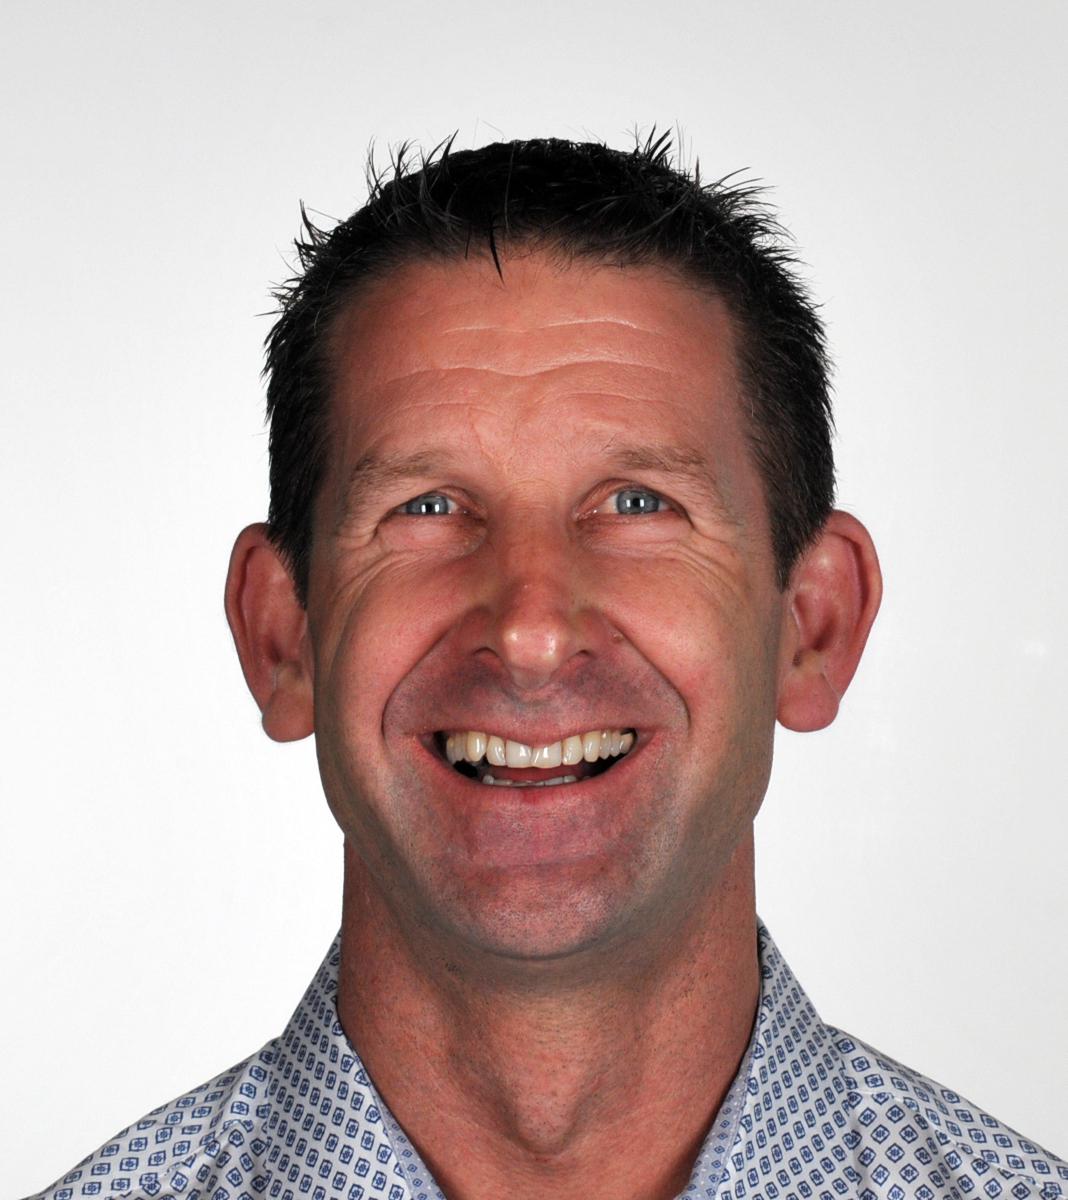 Michael McManus Joins HOKA ONE ONE as Senior Sports Marketing Manager